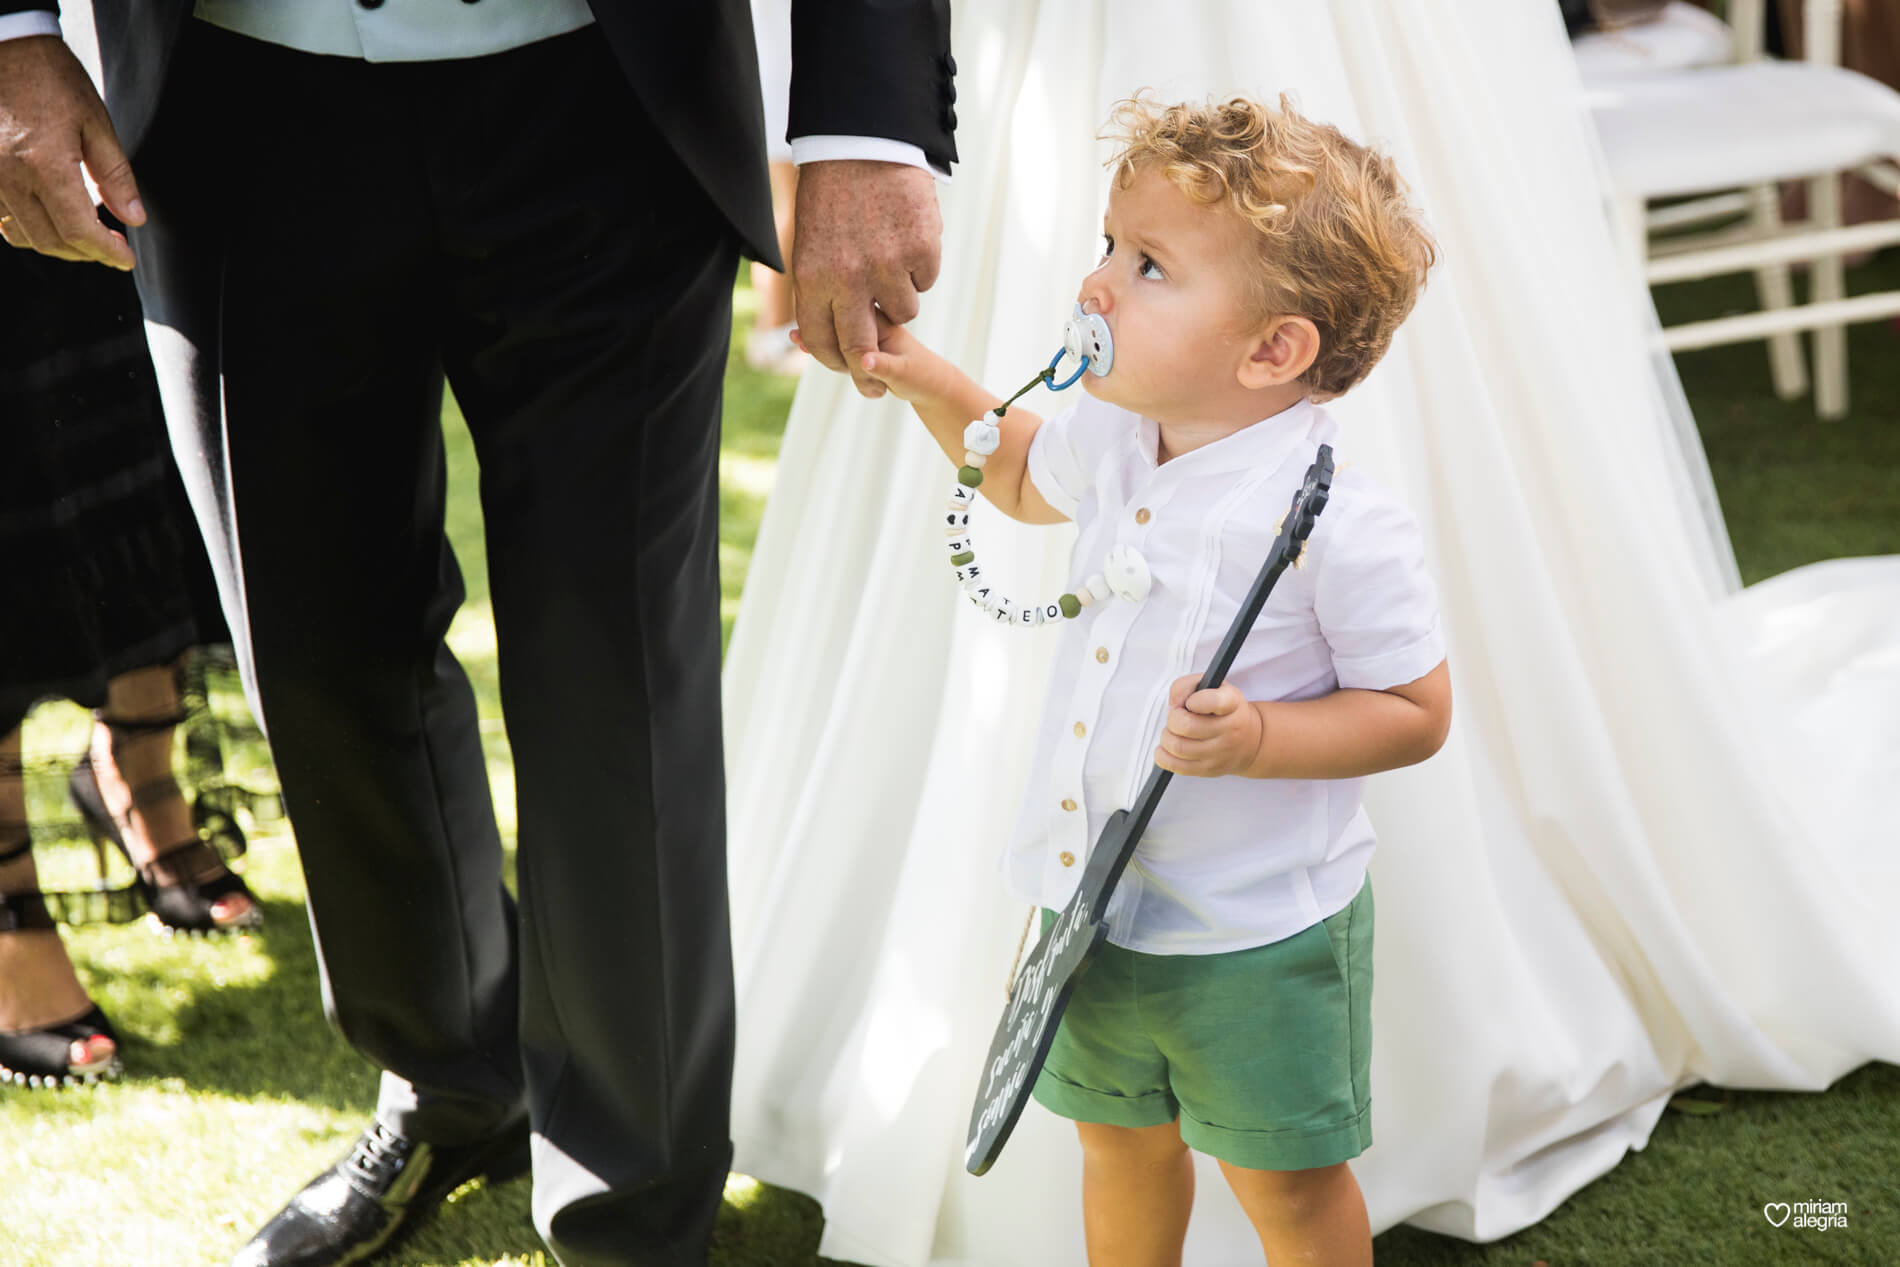 la-boda-de-alemc7-miriam-alegria-fotografos-boda-murcia-44